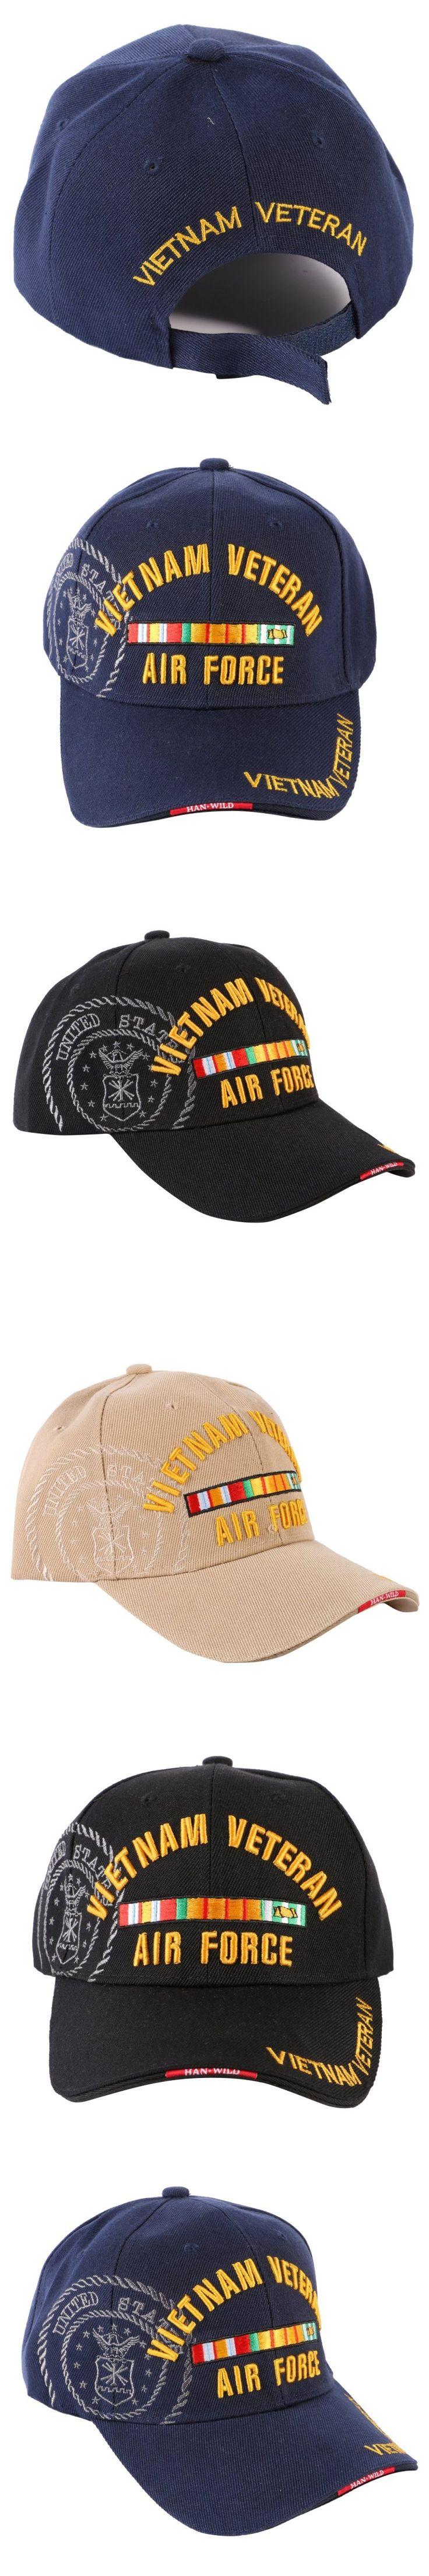 Vintage Cotton Blend Gorras Outdoor Memorable Air Force Cap Snapback Baseball Cap US Army Hats